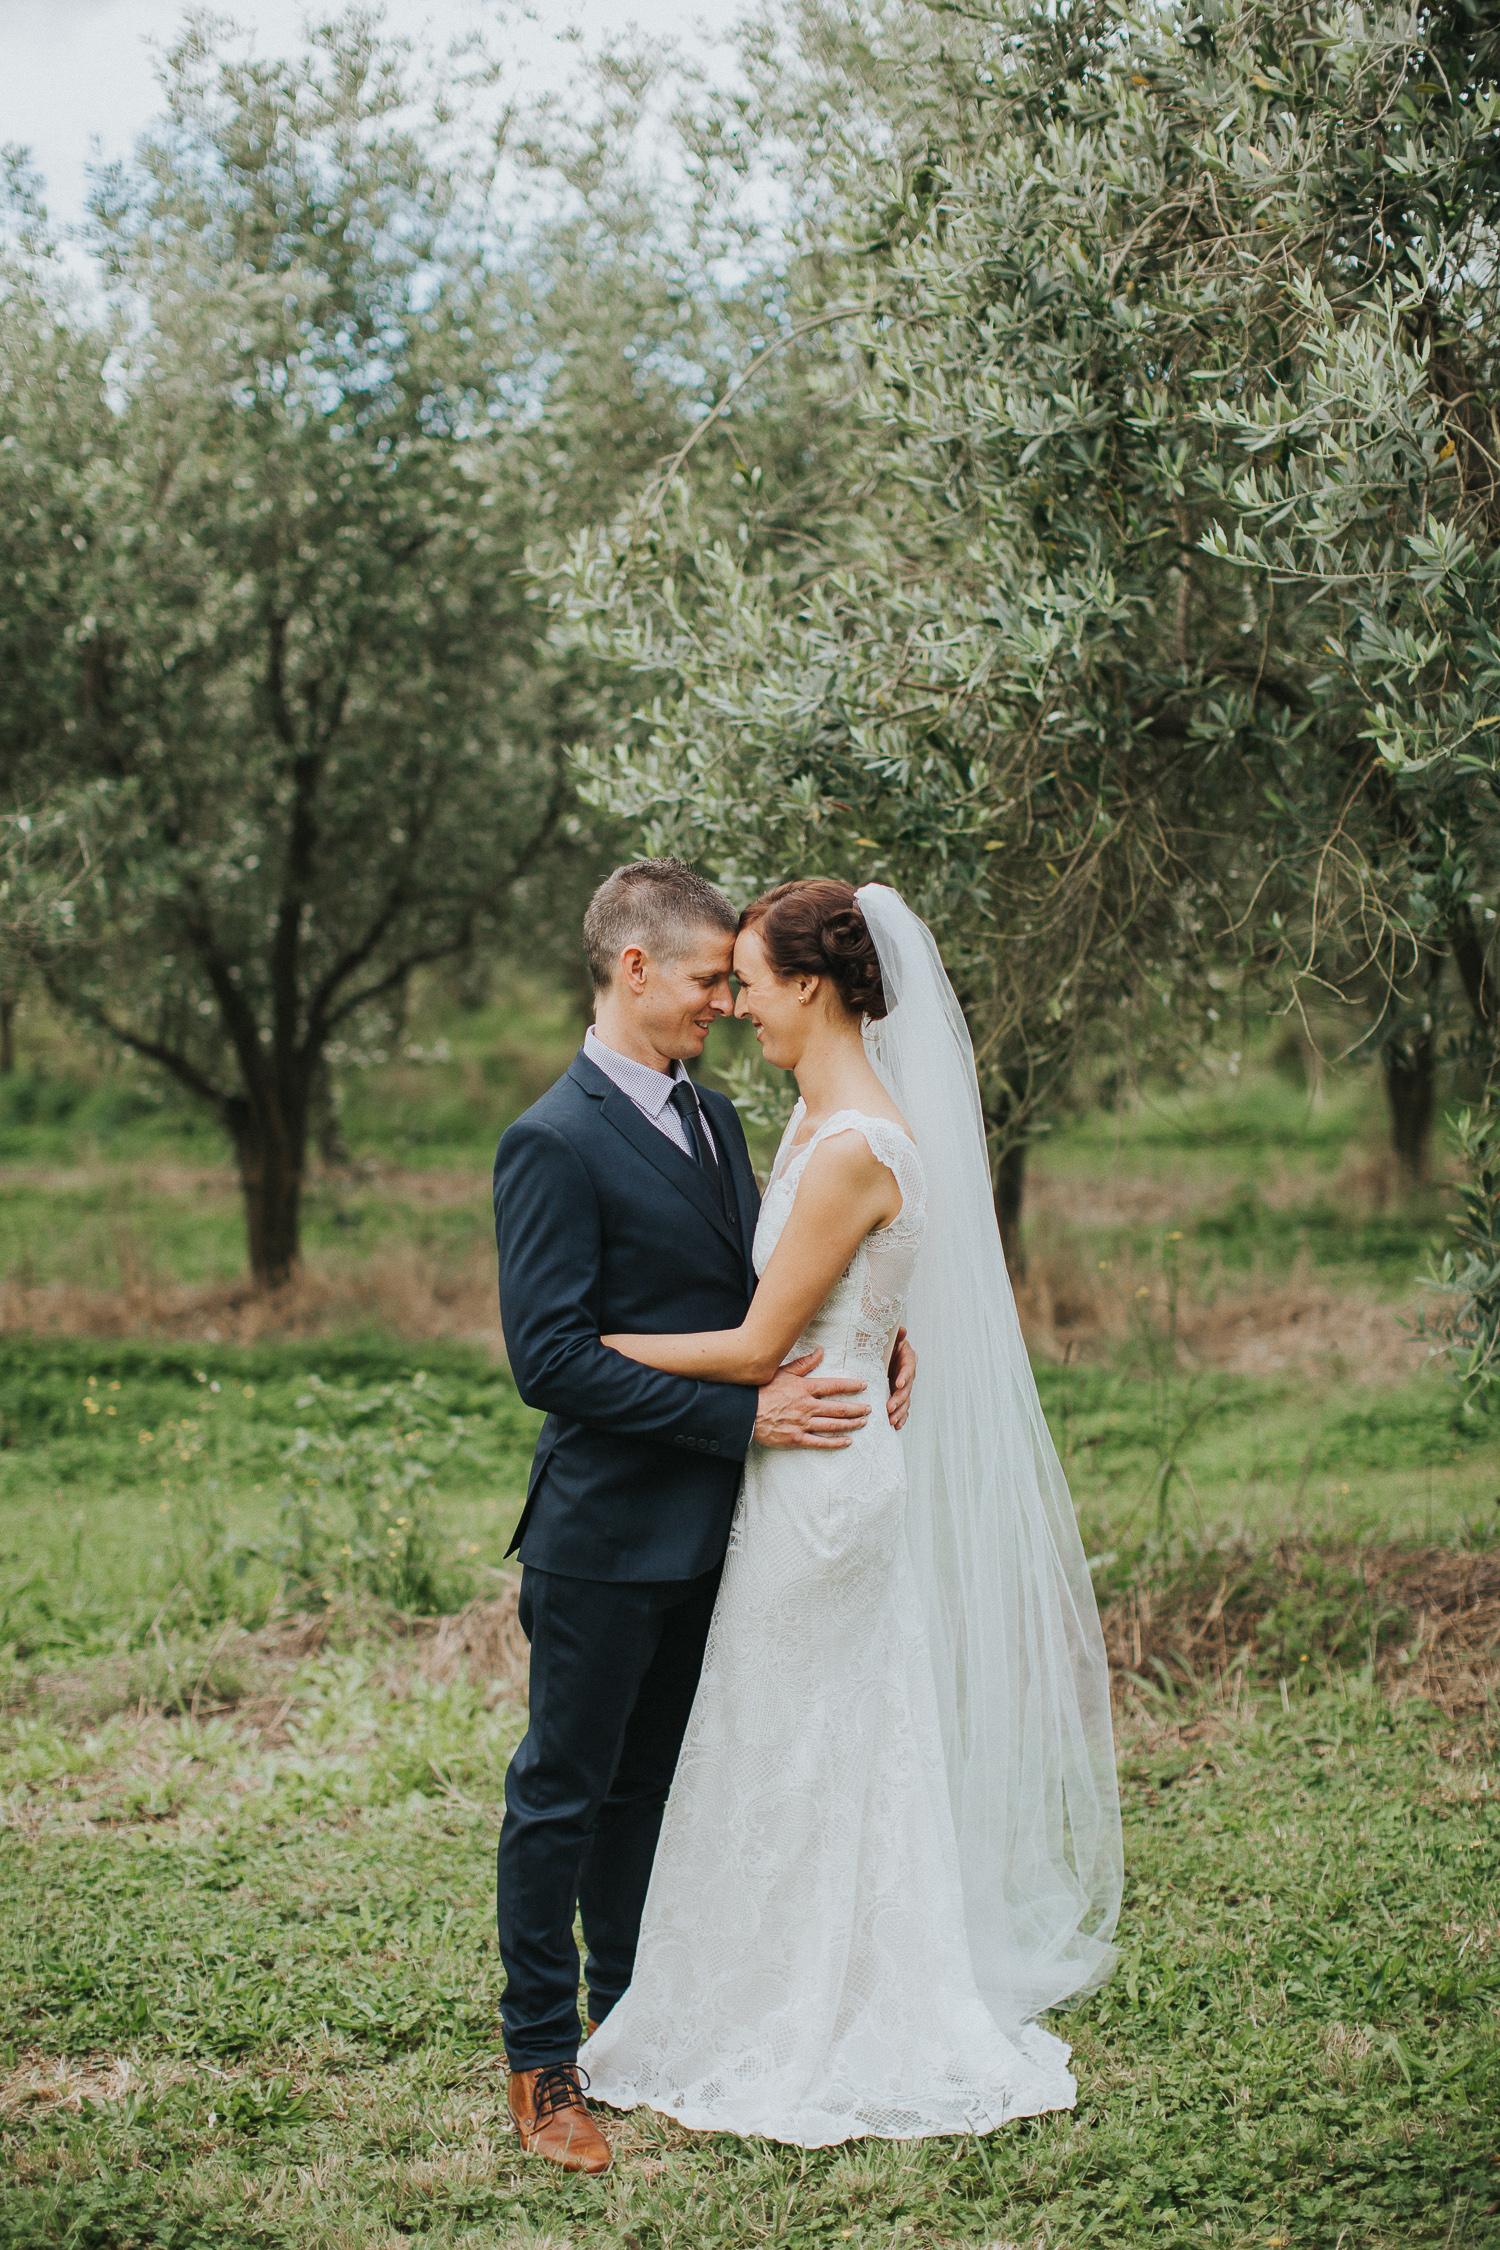 LIZ ANDREW BRACU WEDDING090.JPG